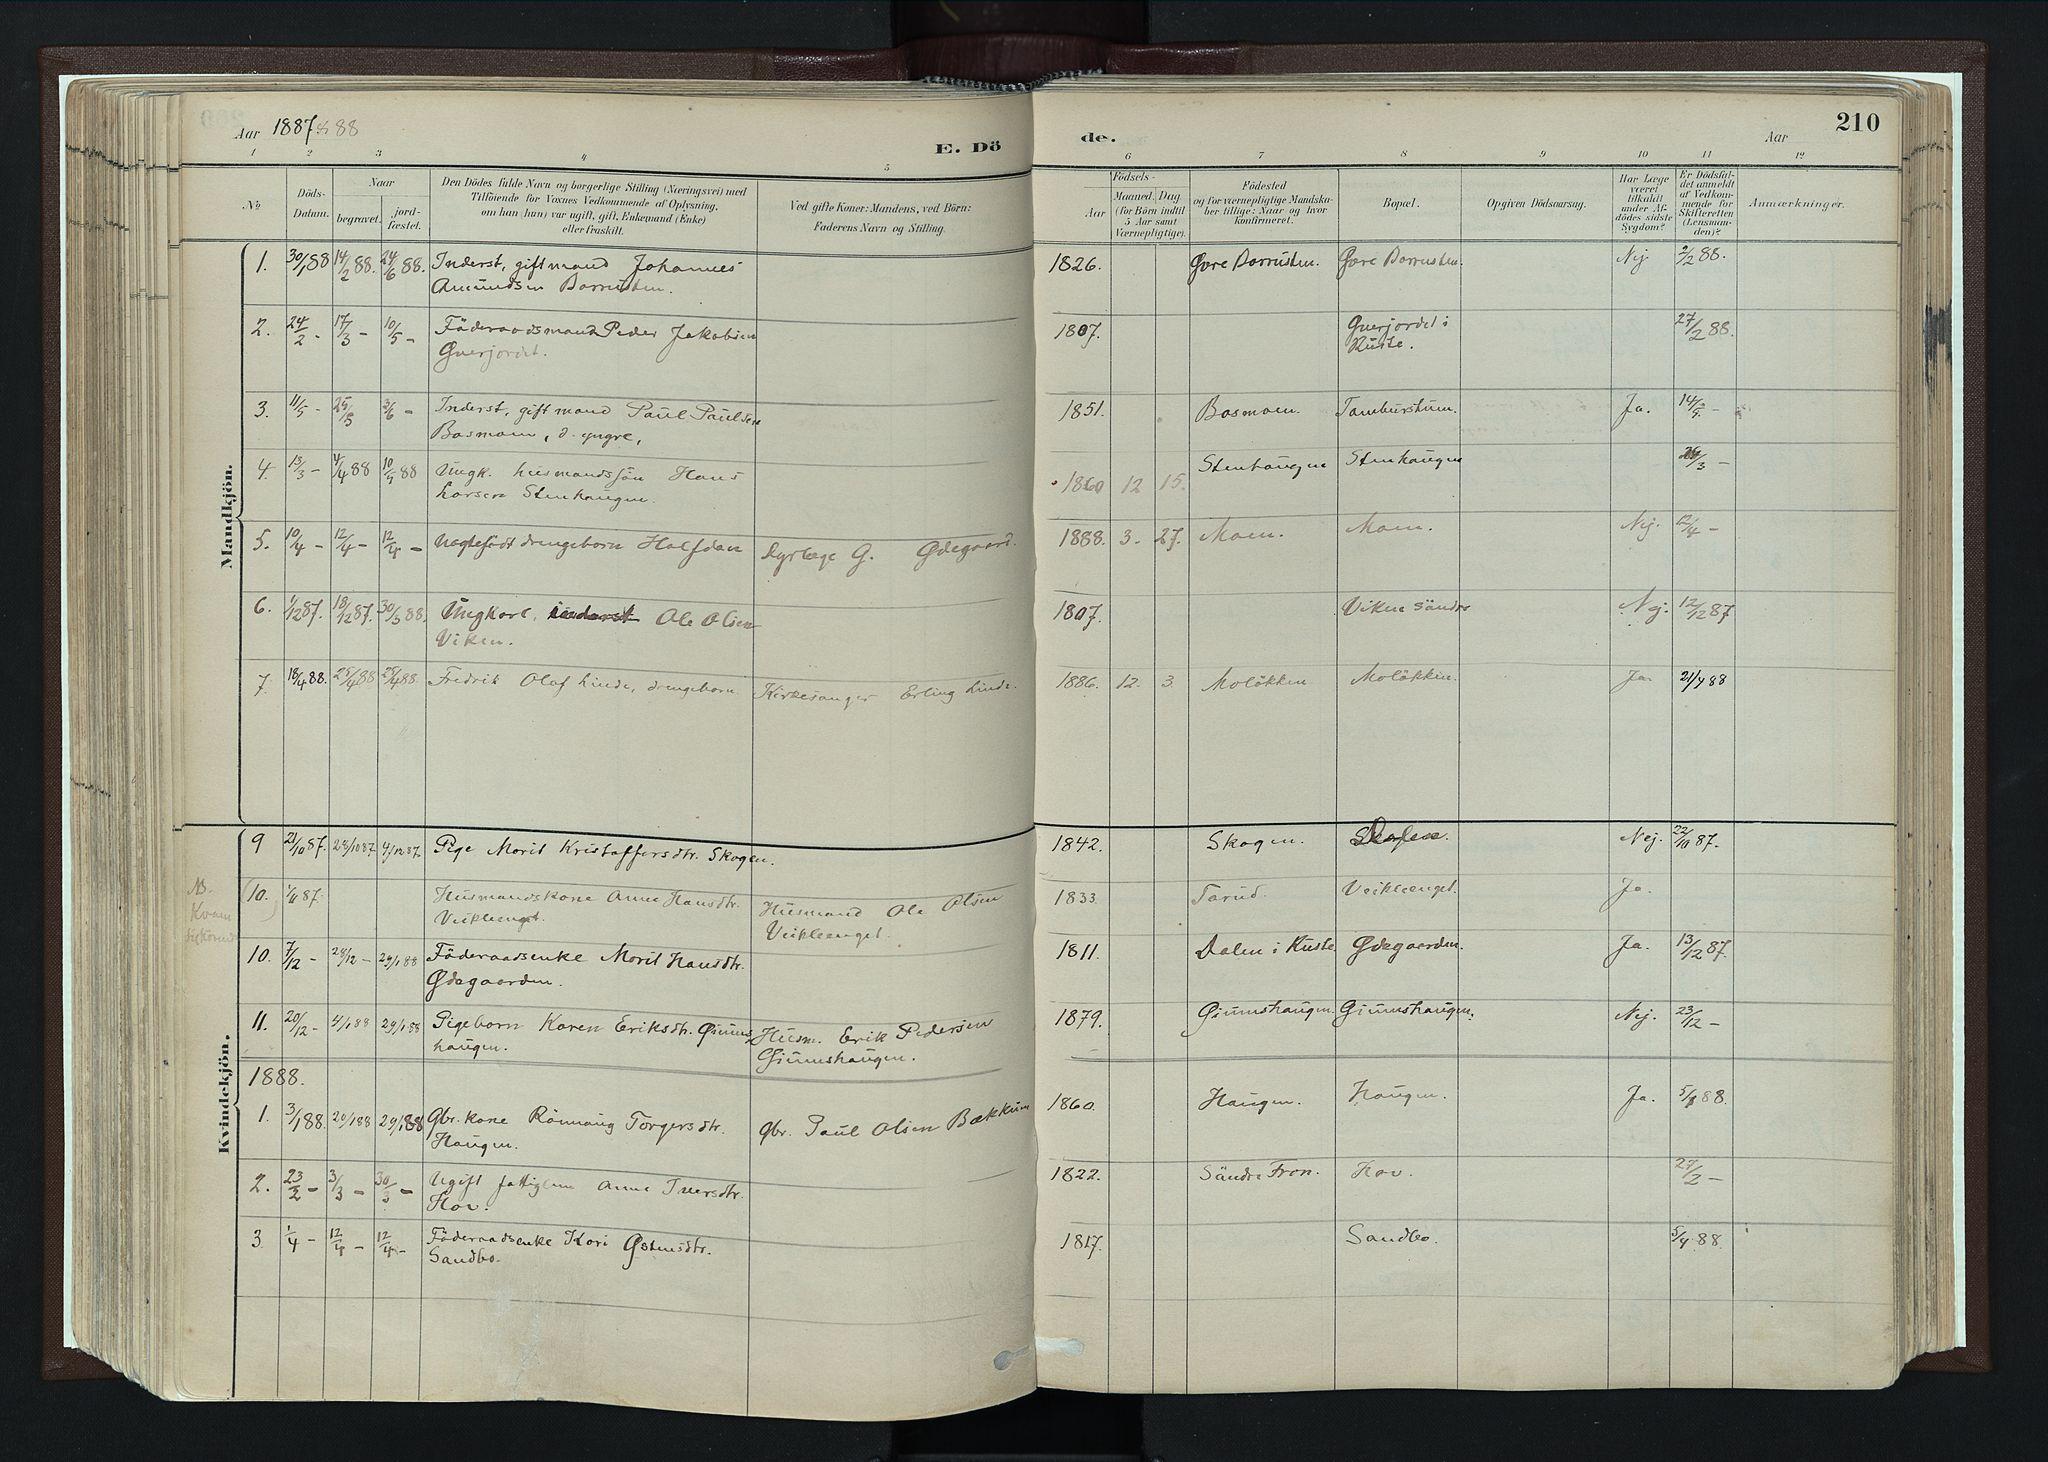 SAH, Nord-Fron prestekontor, Ministerialbok nr. 4, 1884-1914, s. 210